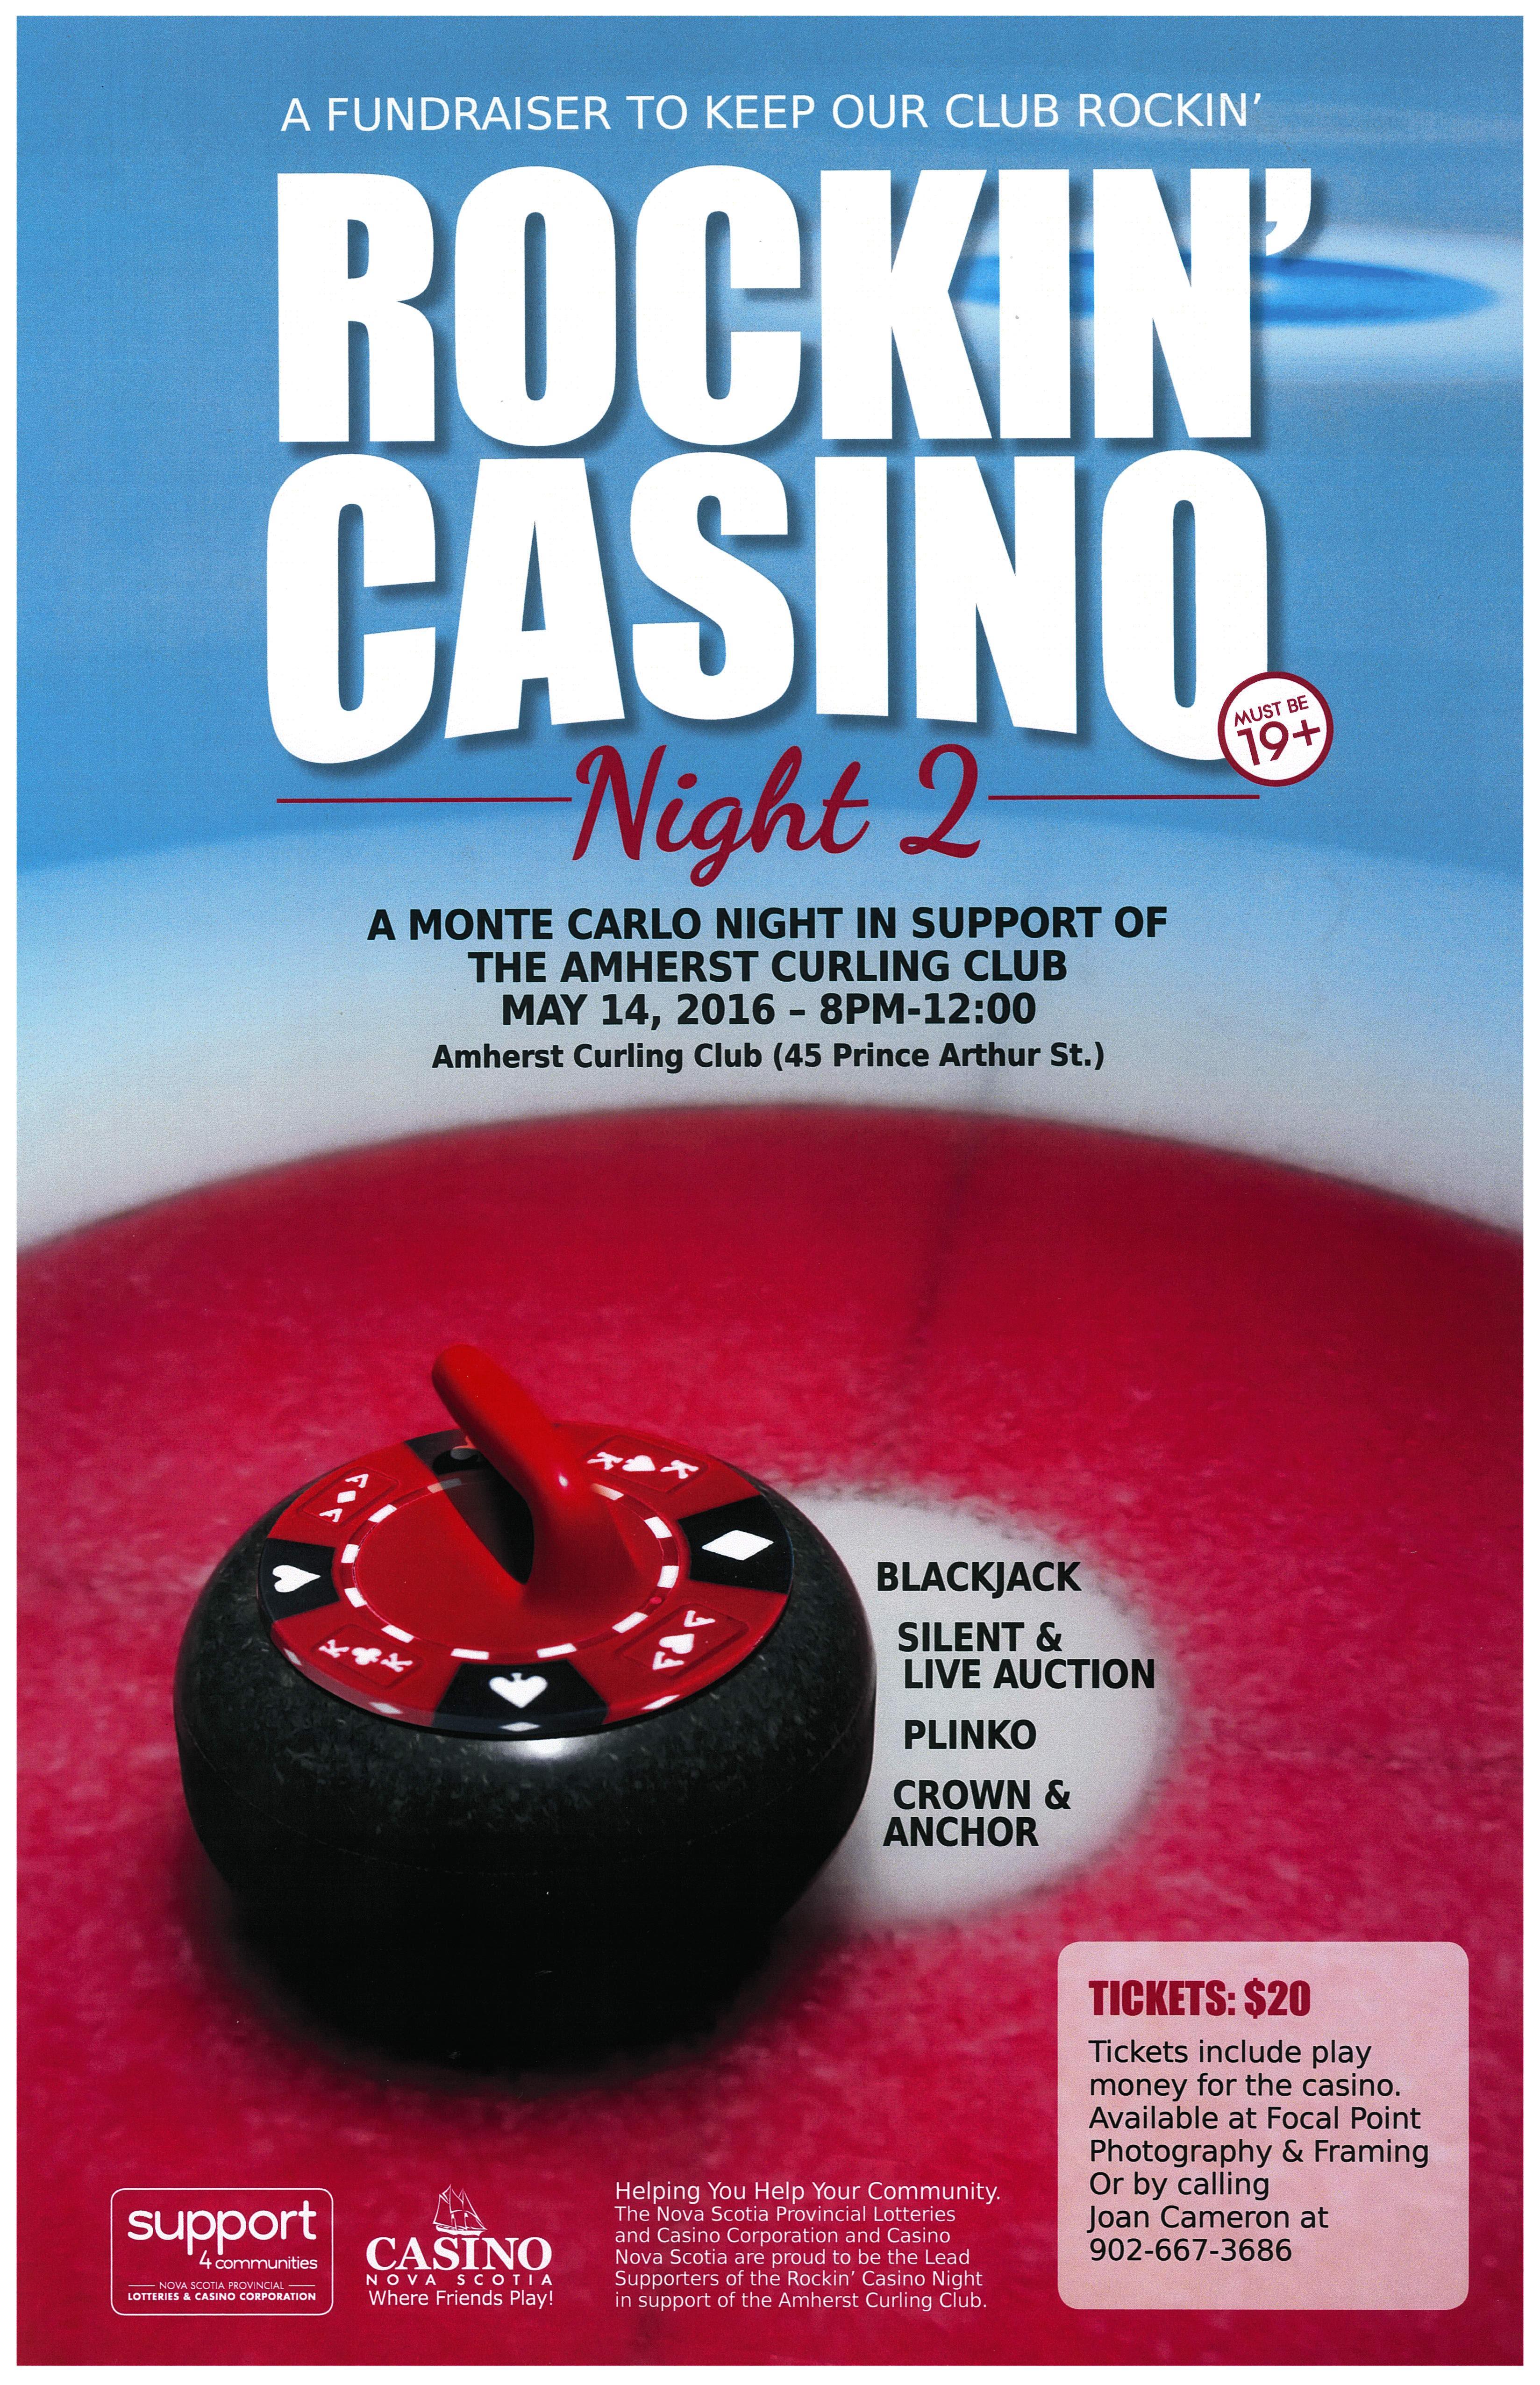 Rockin' Casino Night - May 14th, 2016